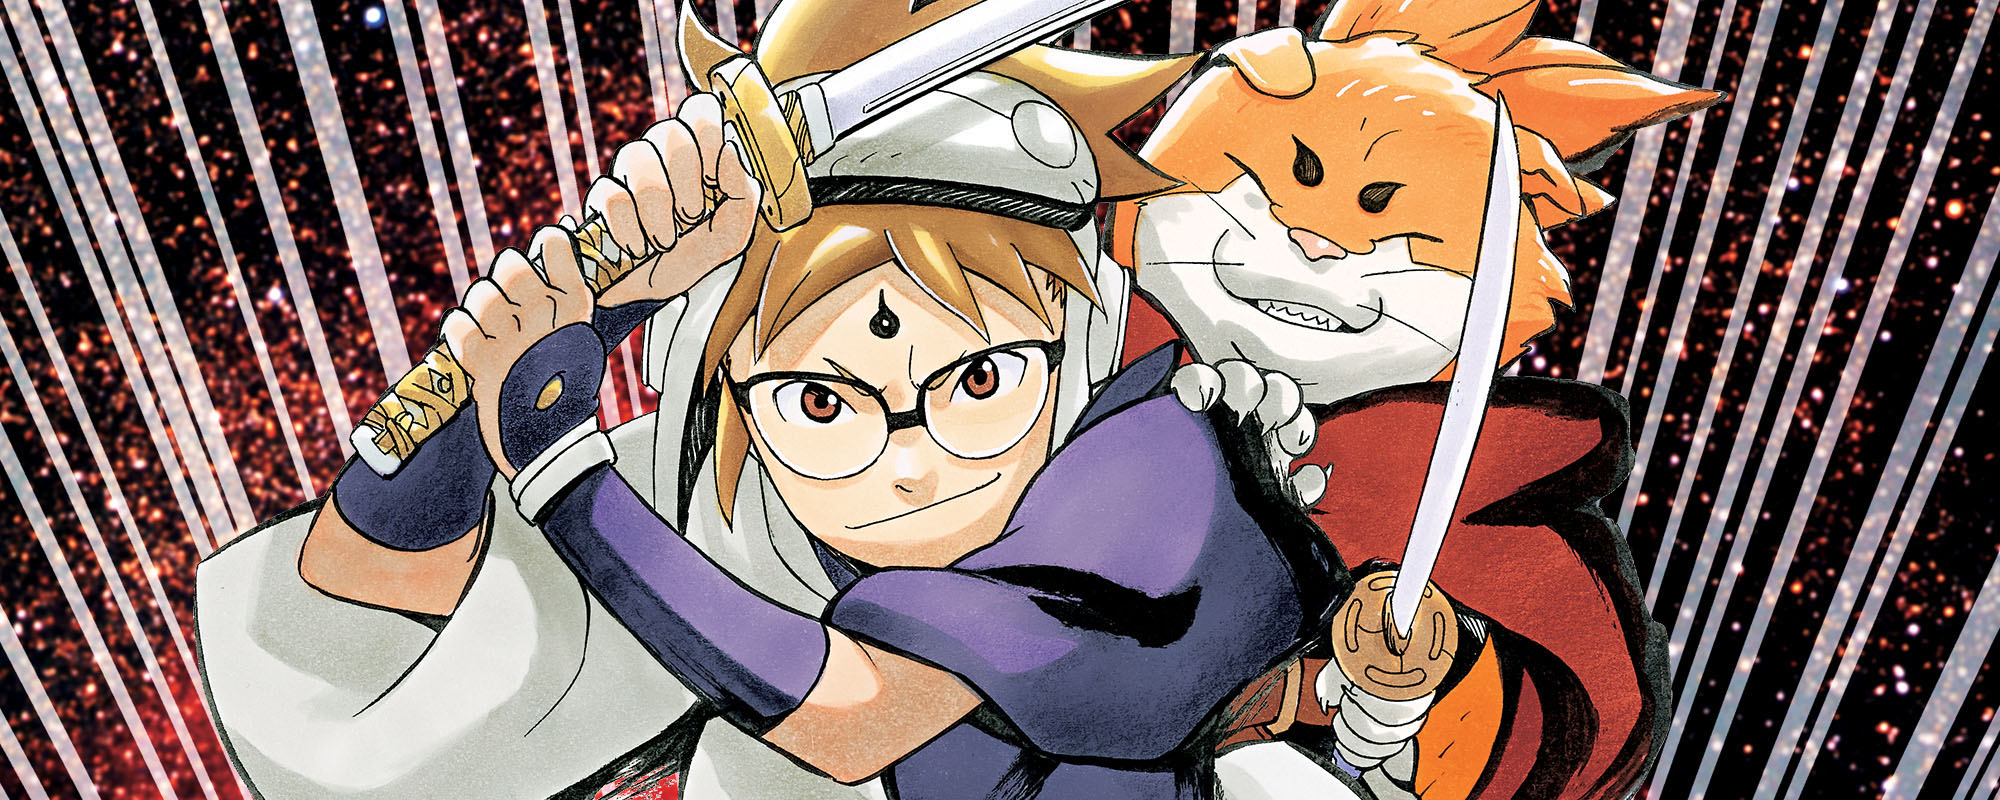 VIZ   Read Samurai 8 Manga Free - Official Shonen Jump From